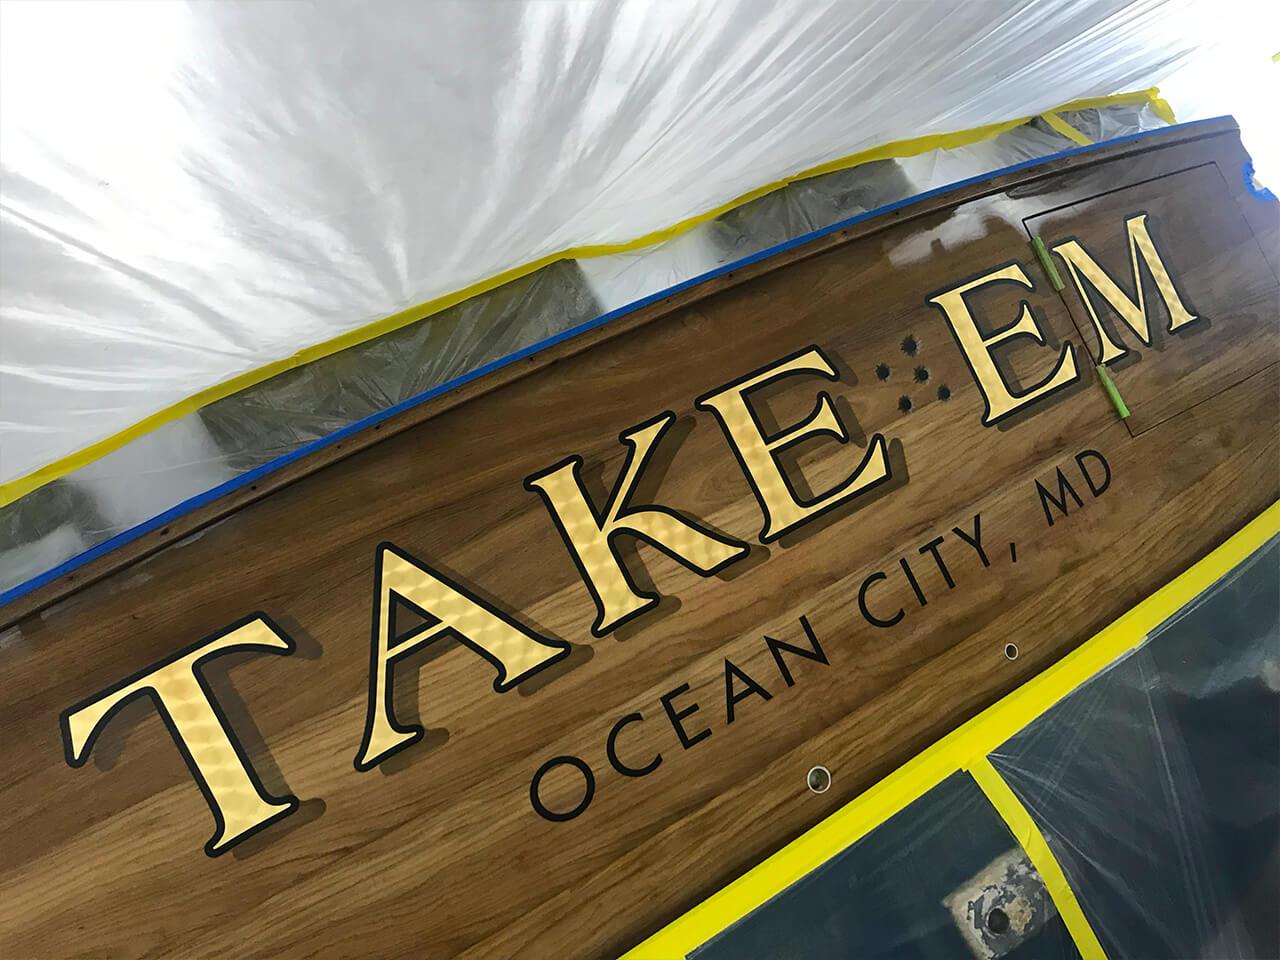 Take Em Ocean City Maryland Boat Transom